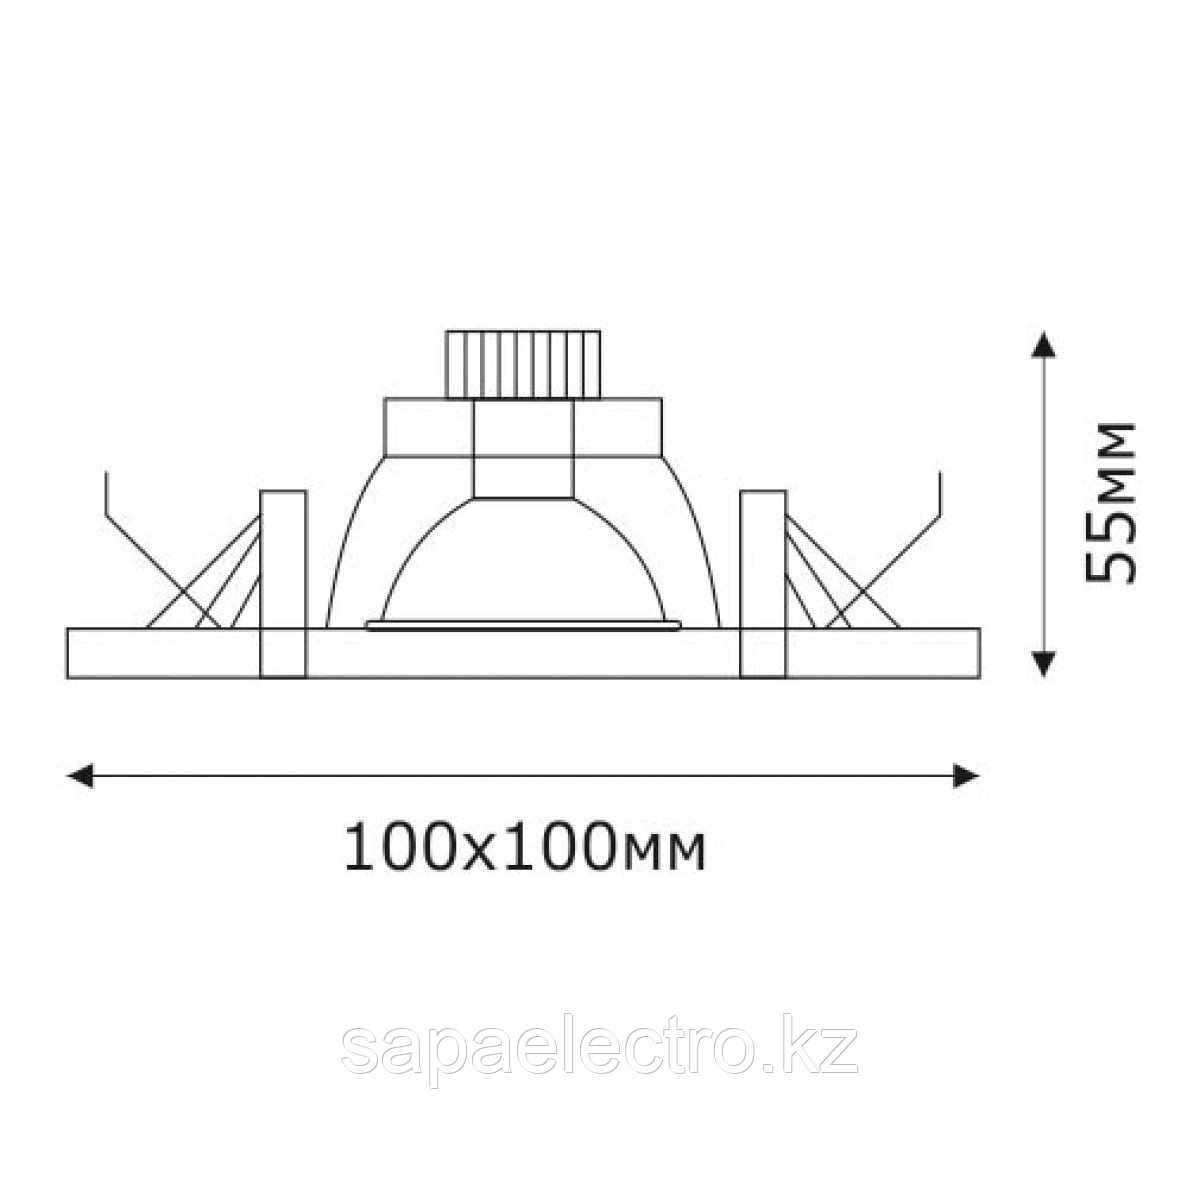 Спот LED HZ-QQ SQUARE 3W 5000K (TS) 60шт